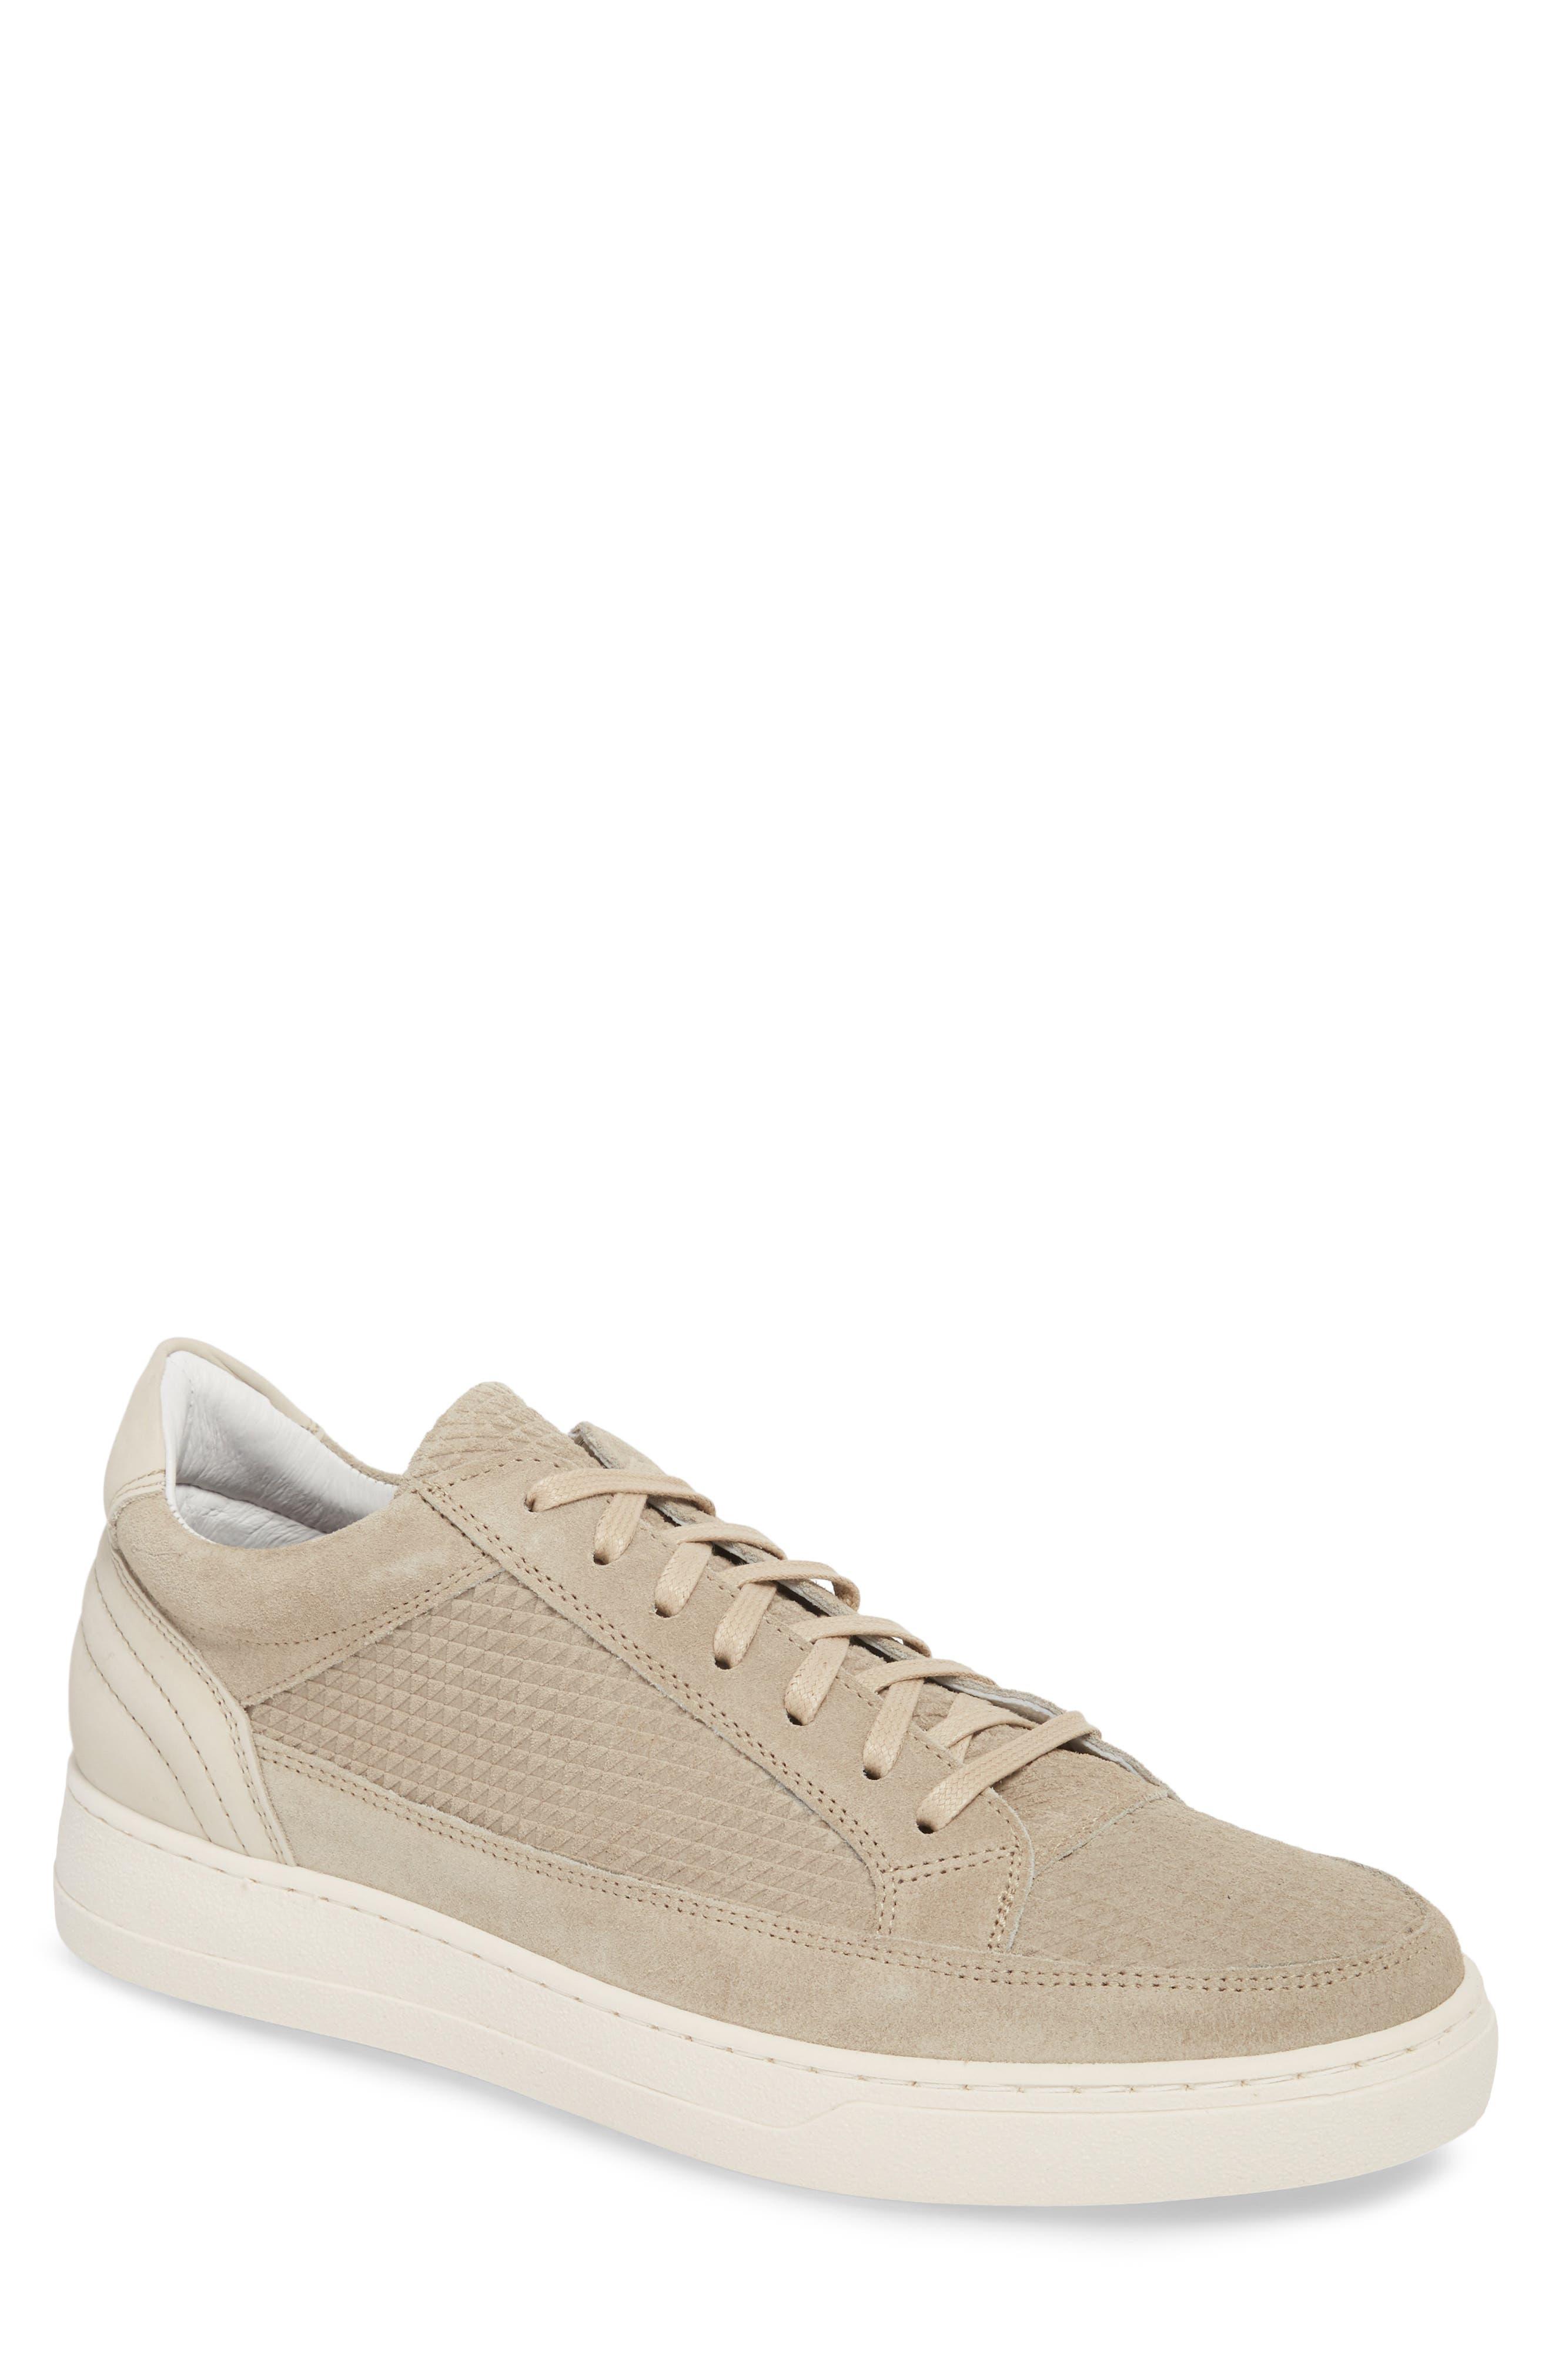 Reid Embossed Water Resistant Sneaker,                             Main thumbnail 1, color,                             Sand